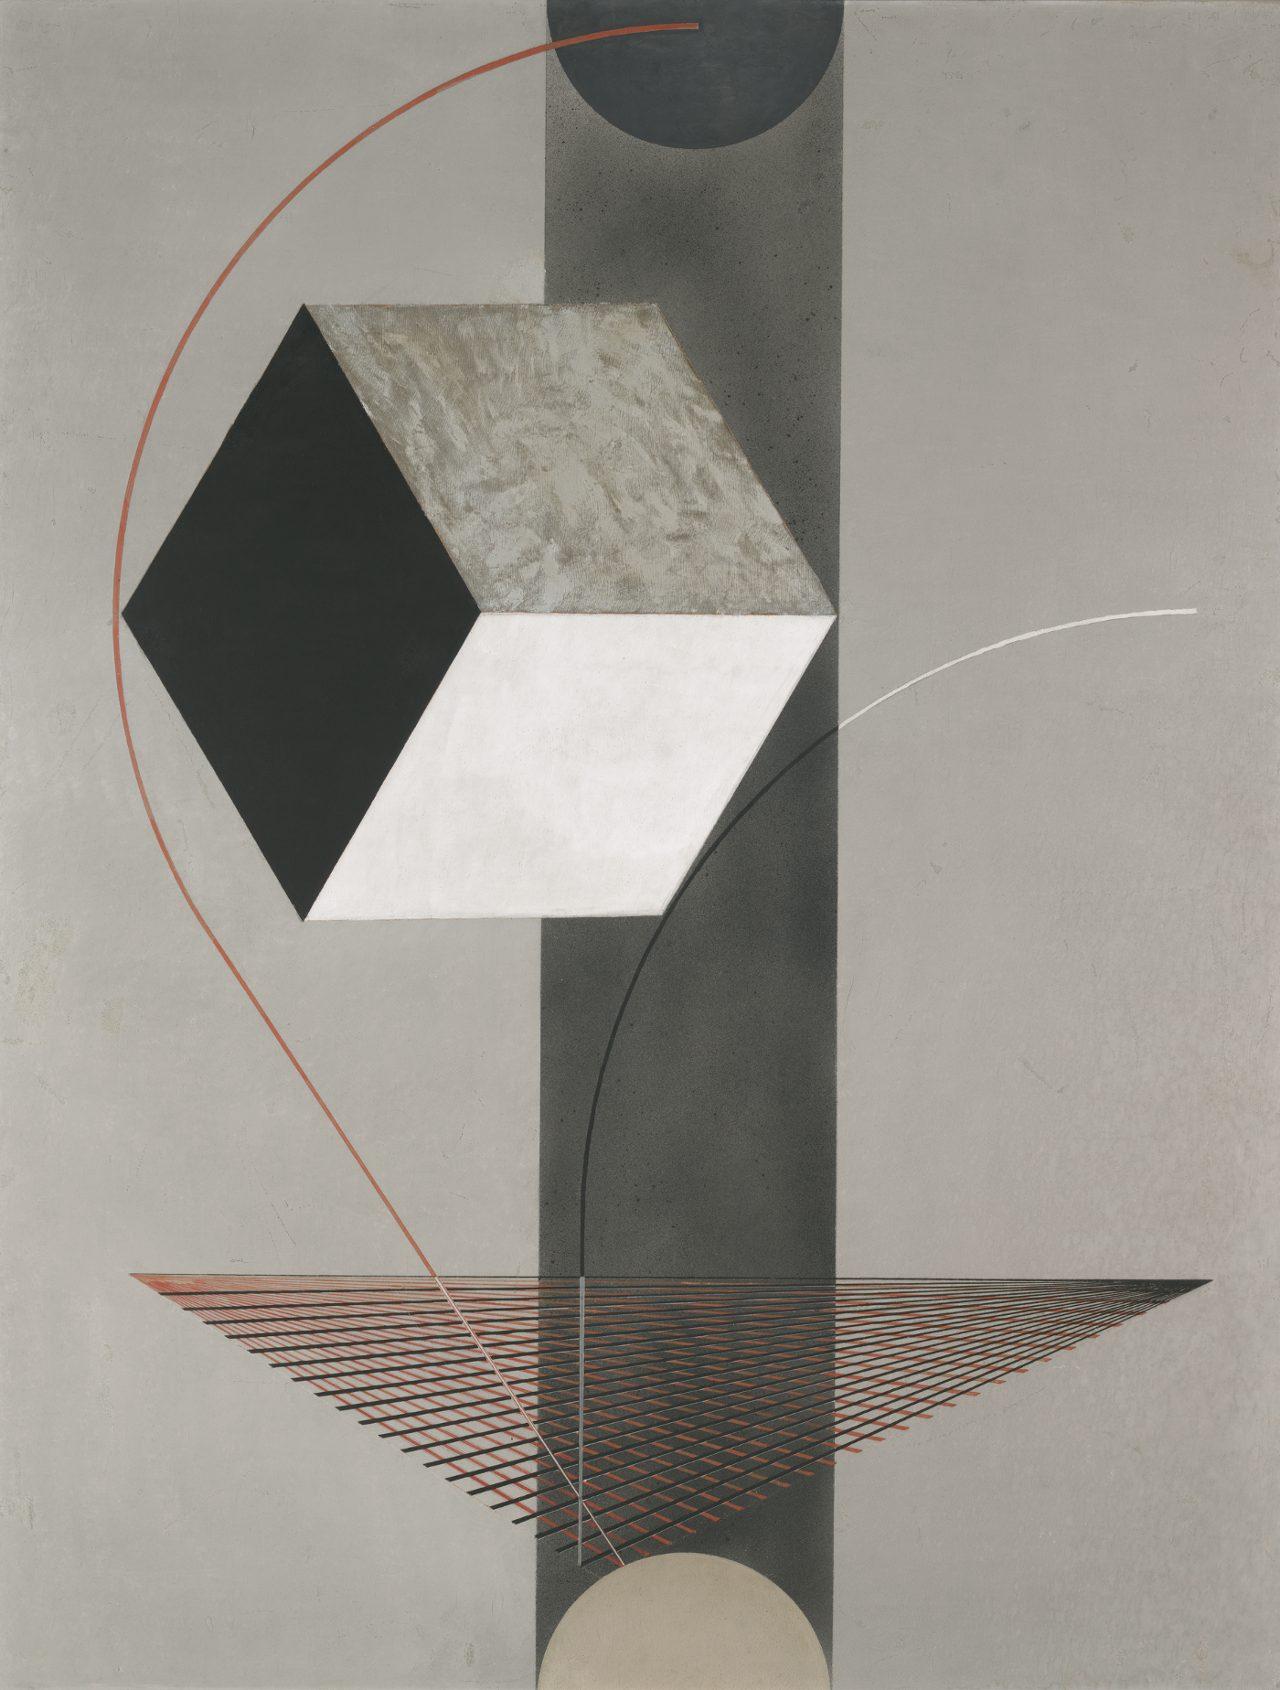 """Proun 99,"" El Lissitzky   Source: Yale University Art Gallery"